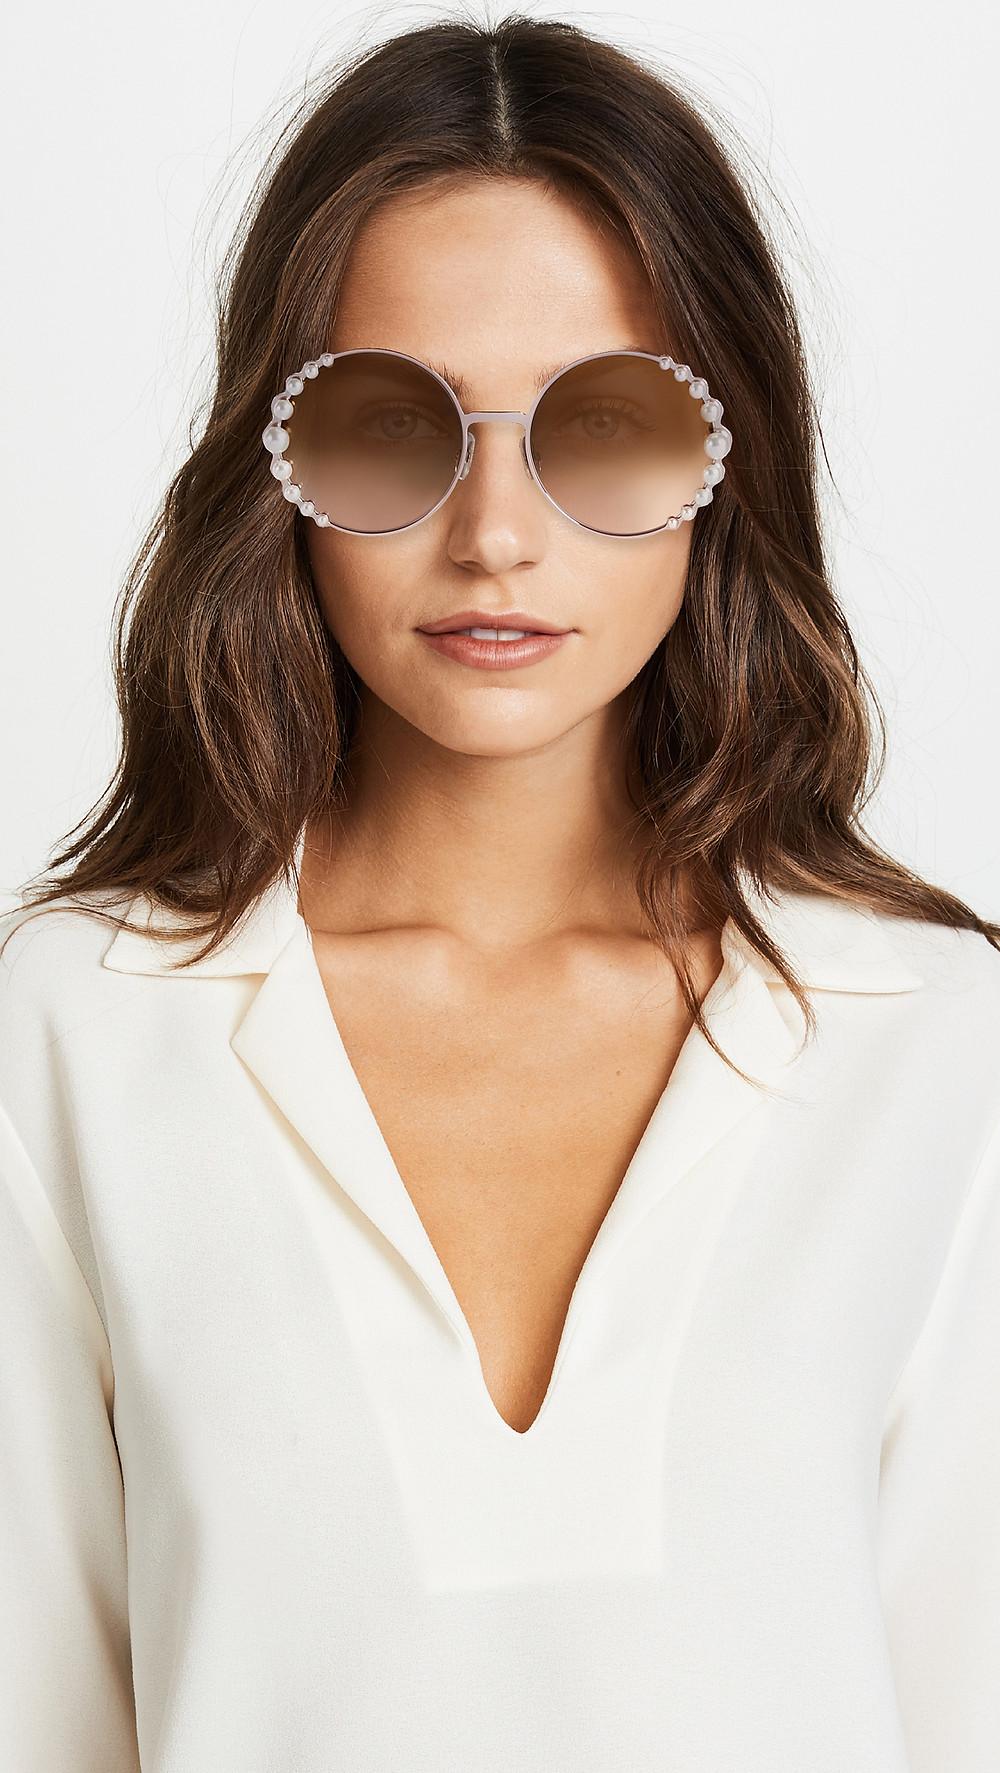 Fendi Round Pearl Frame Sunglasses $540